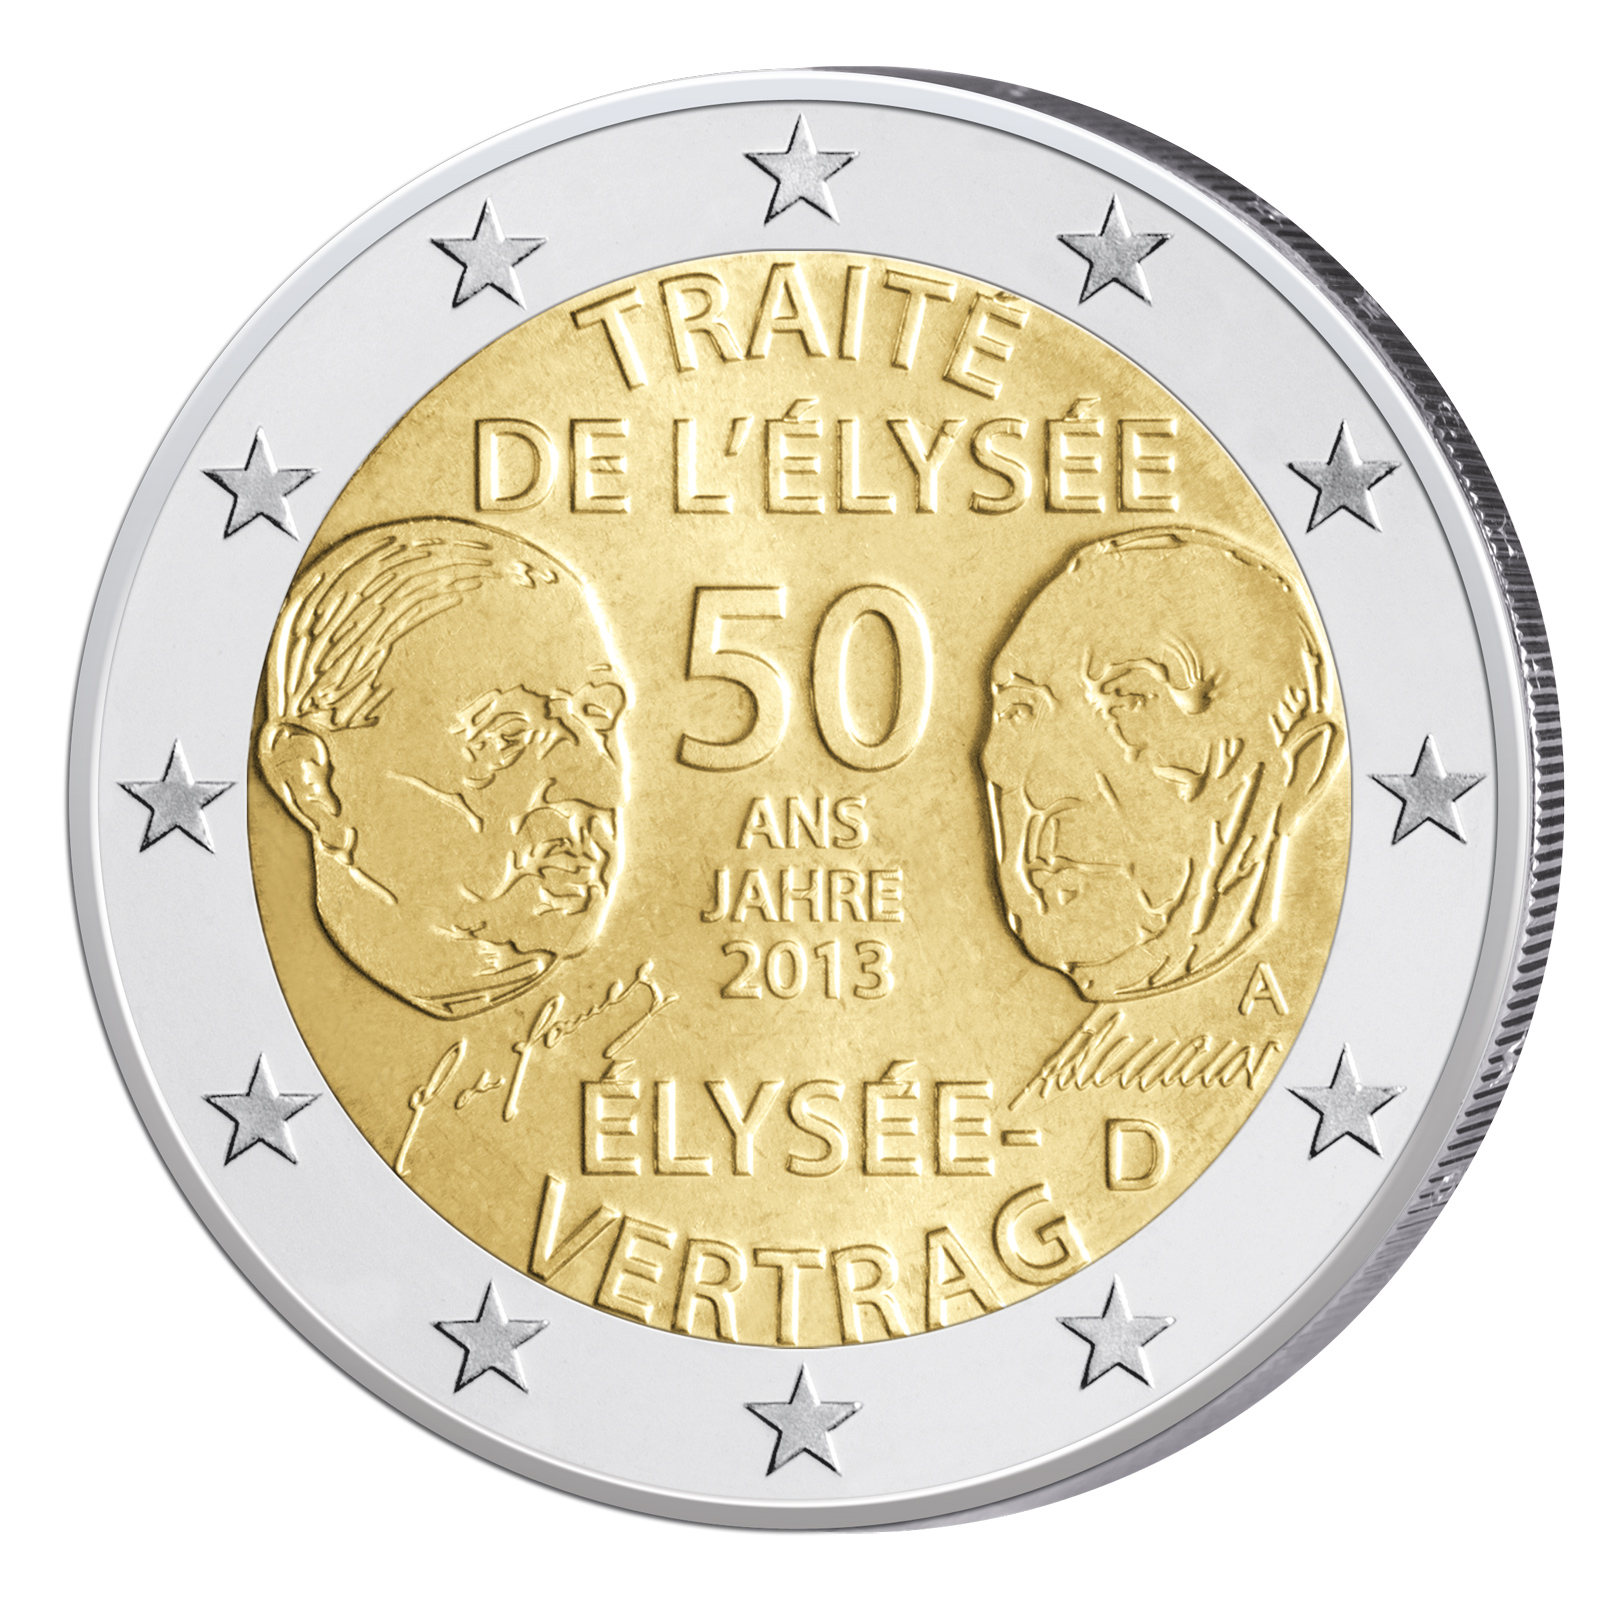 22 Januar 1963 Deutsch Französischer Freundschaftsvertrag